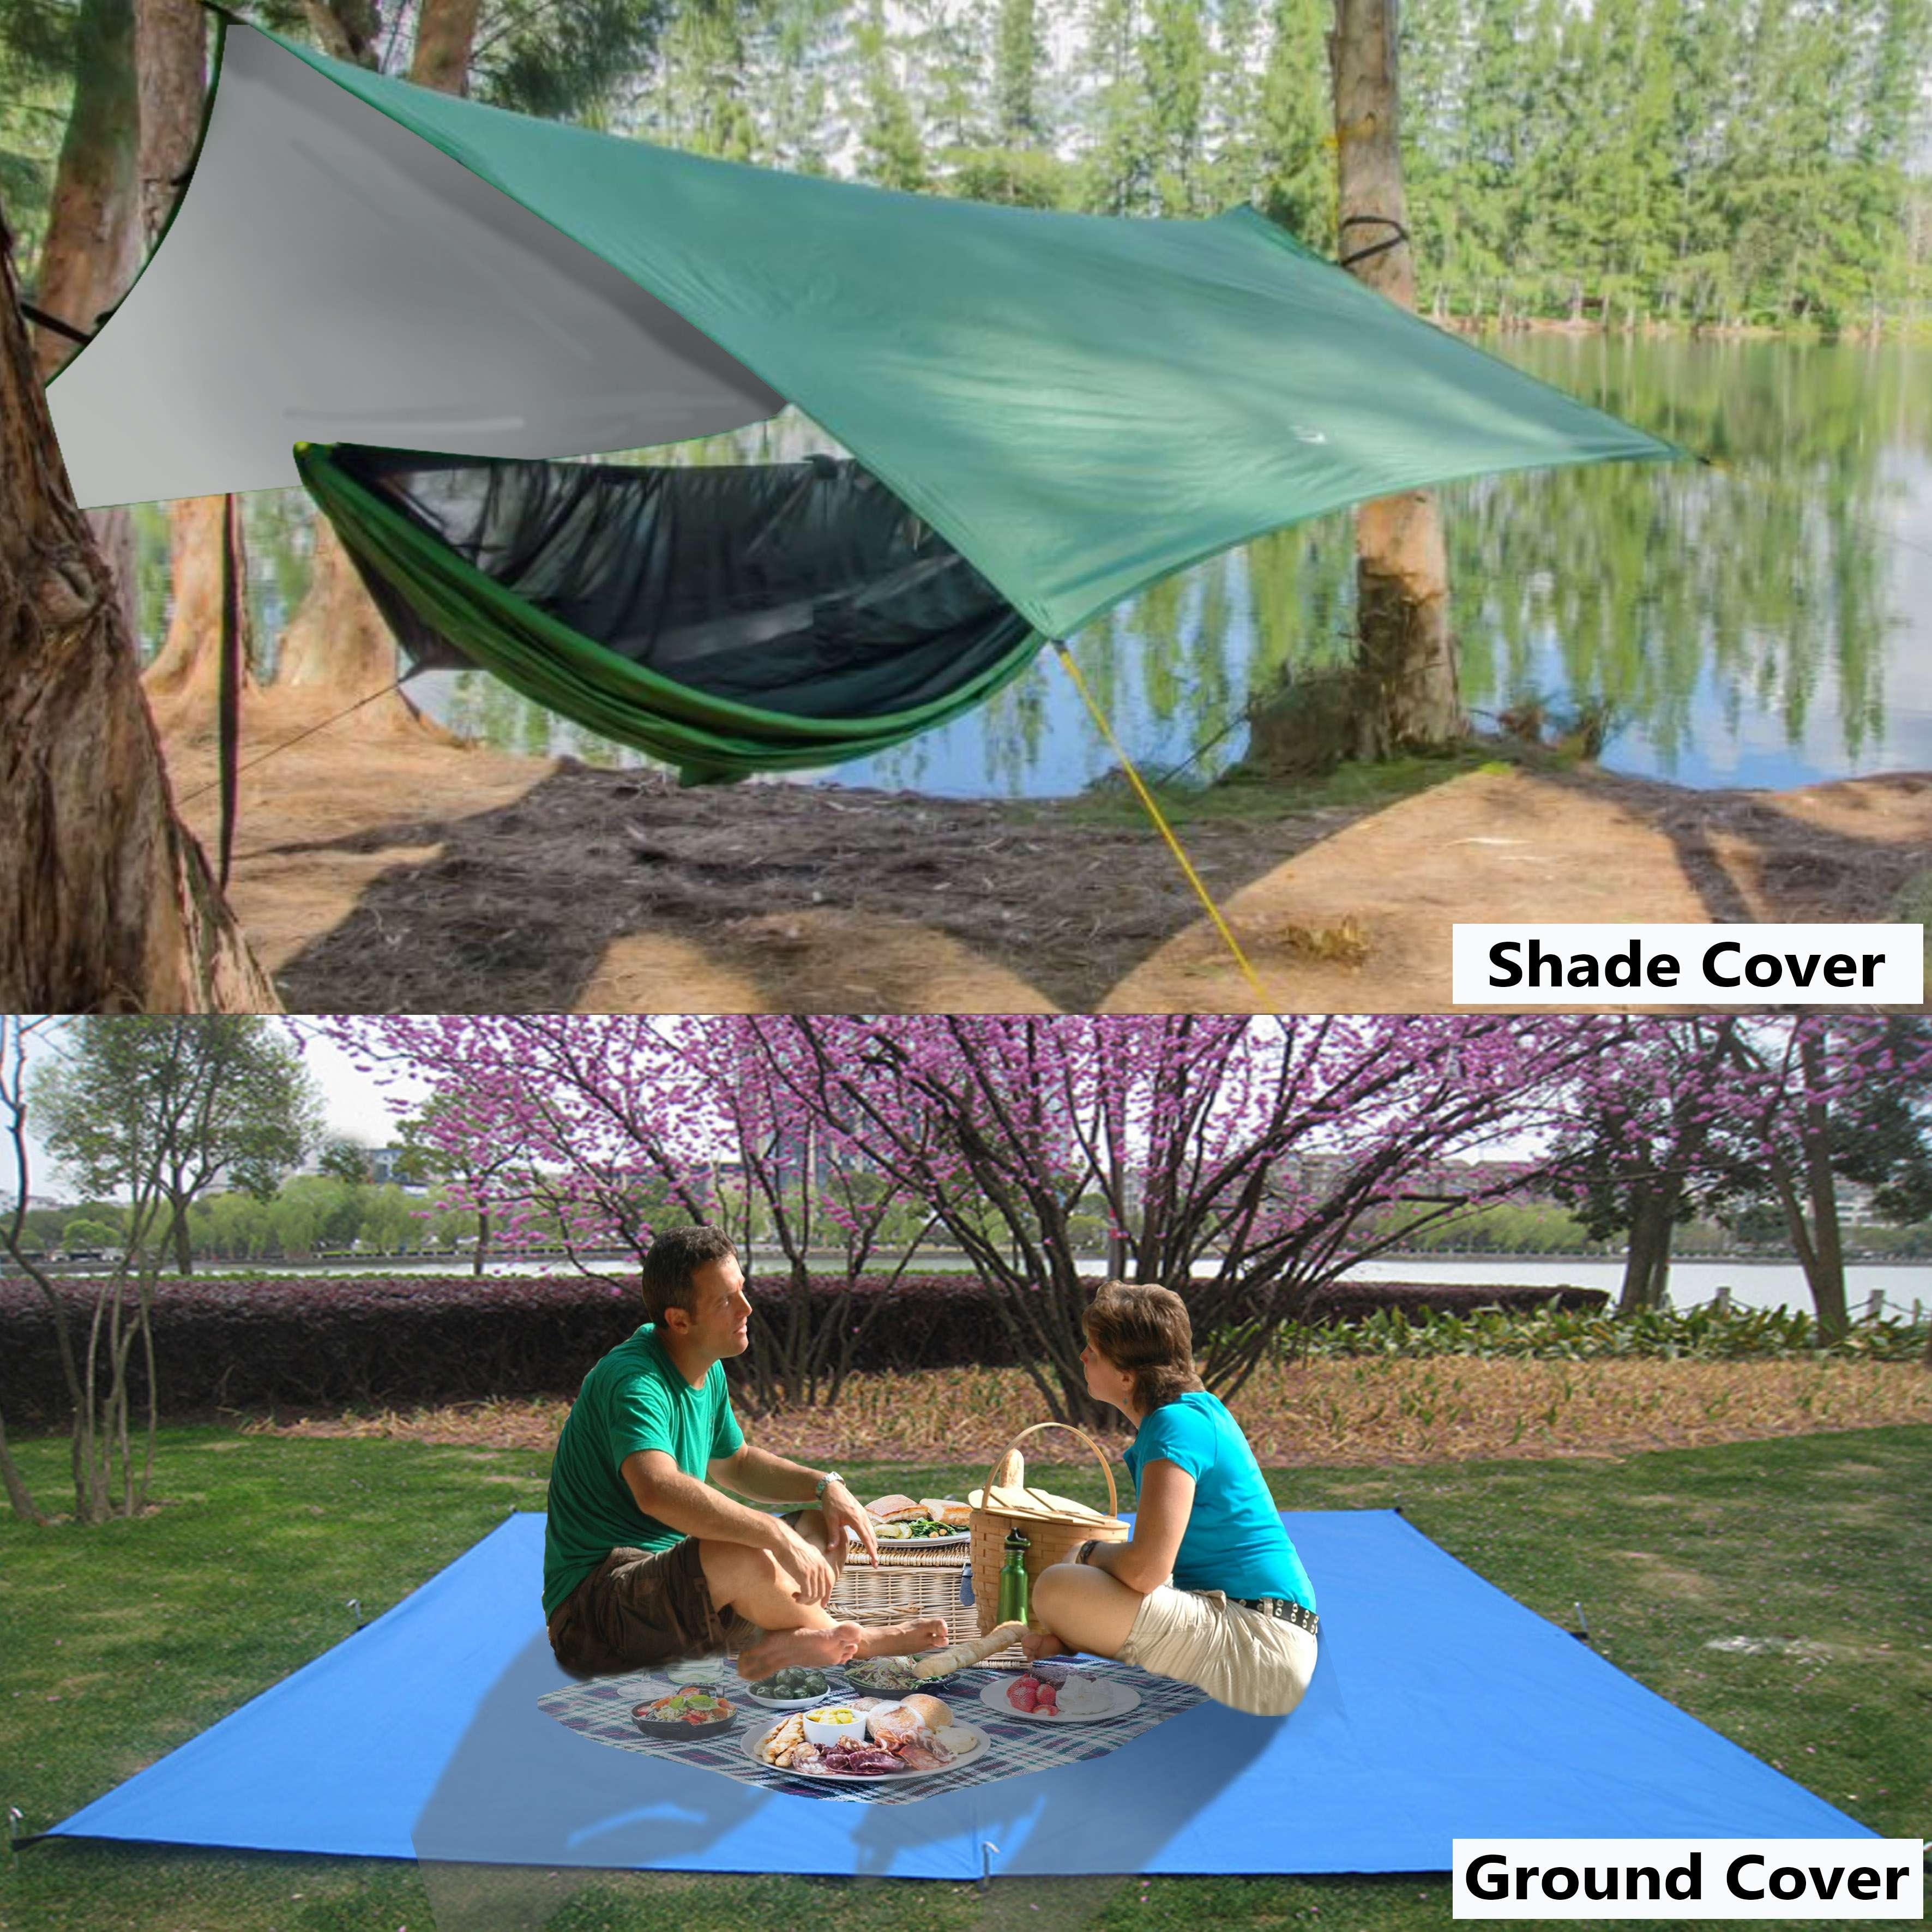 3x3m TENT CANOPY TARP SHADE WATERPROOF COVER - RAIN, HAIL or SHINE